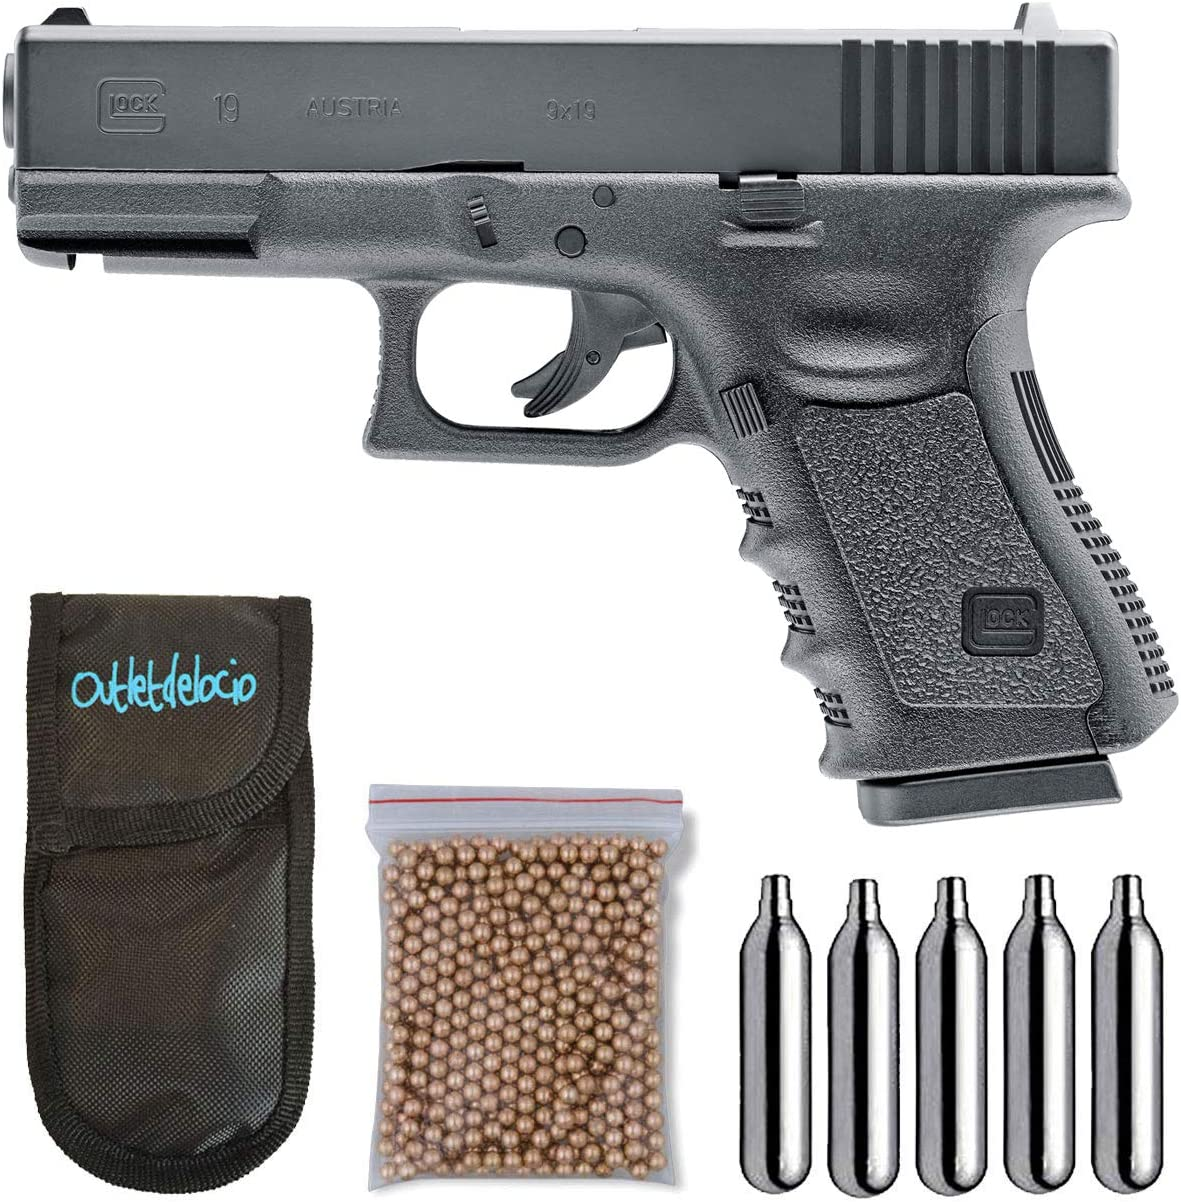 Umarex U58358. Pistola perdigon Glock 19 Gas Co2. 4,5mm. + Funda Portabombonas + Balines + Bombonas co2. 23054/29318/38123